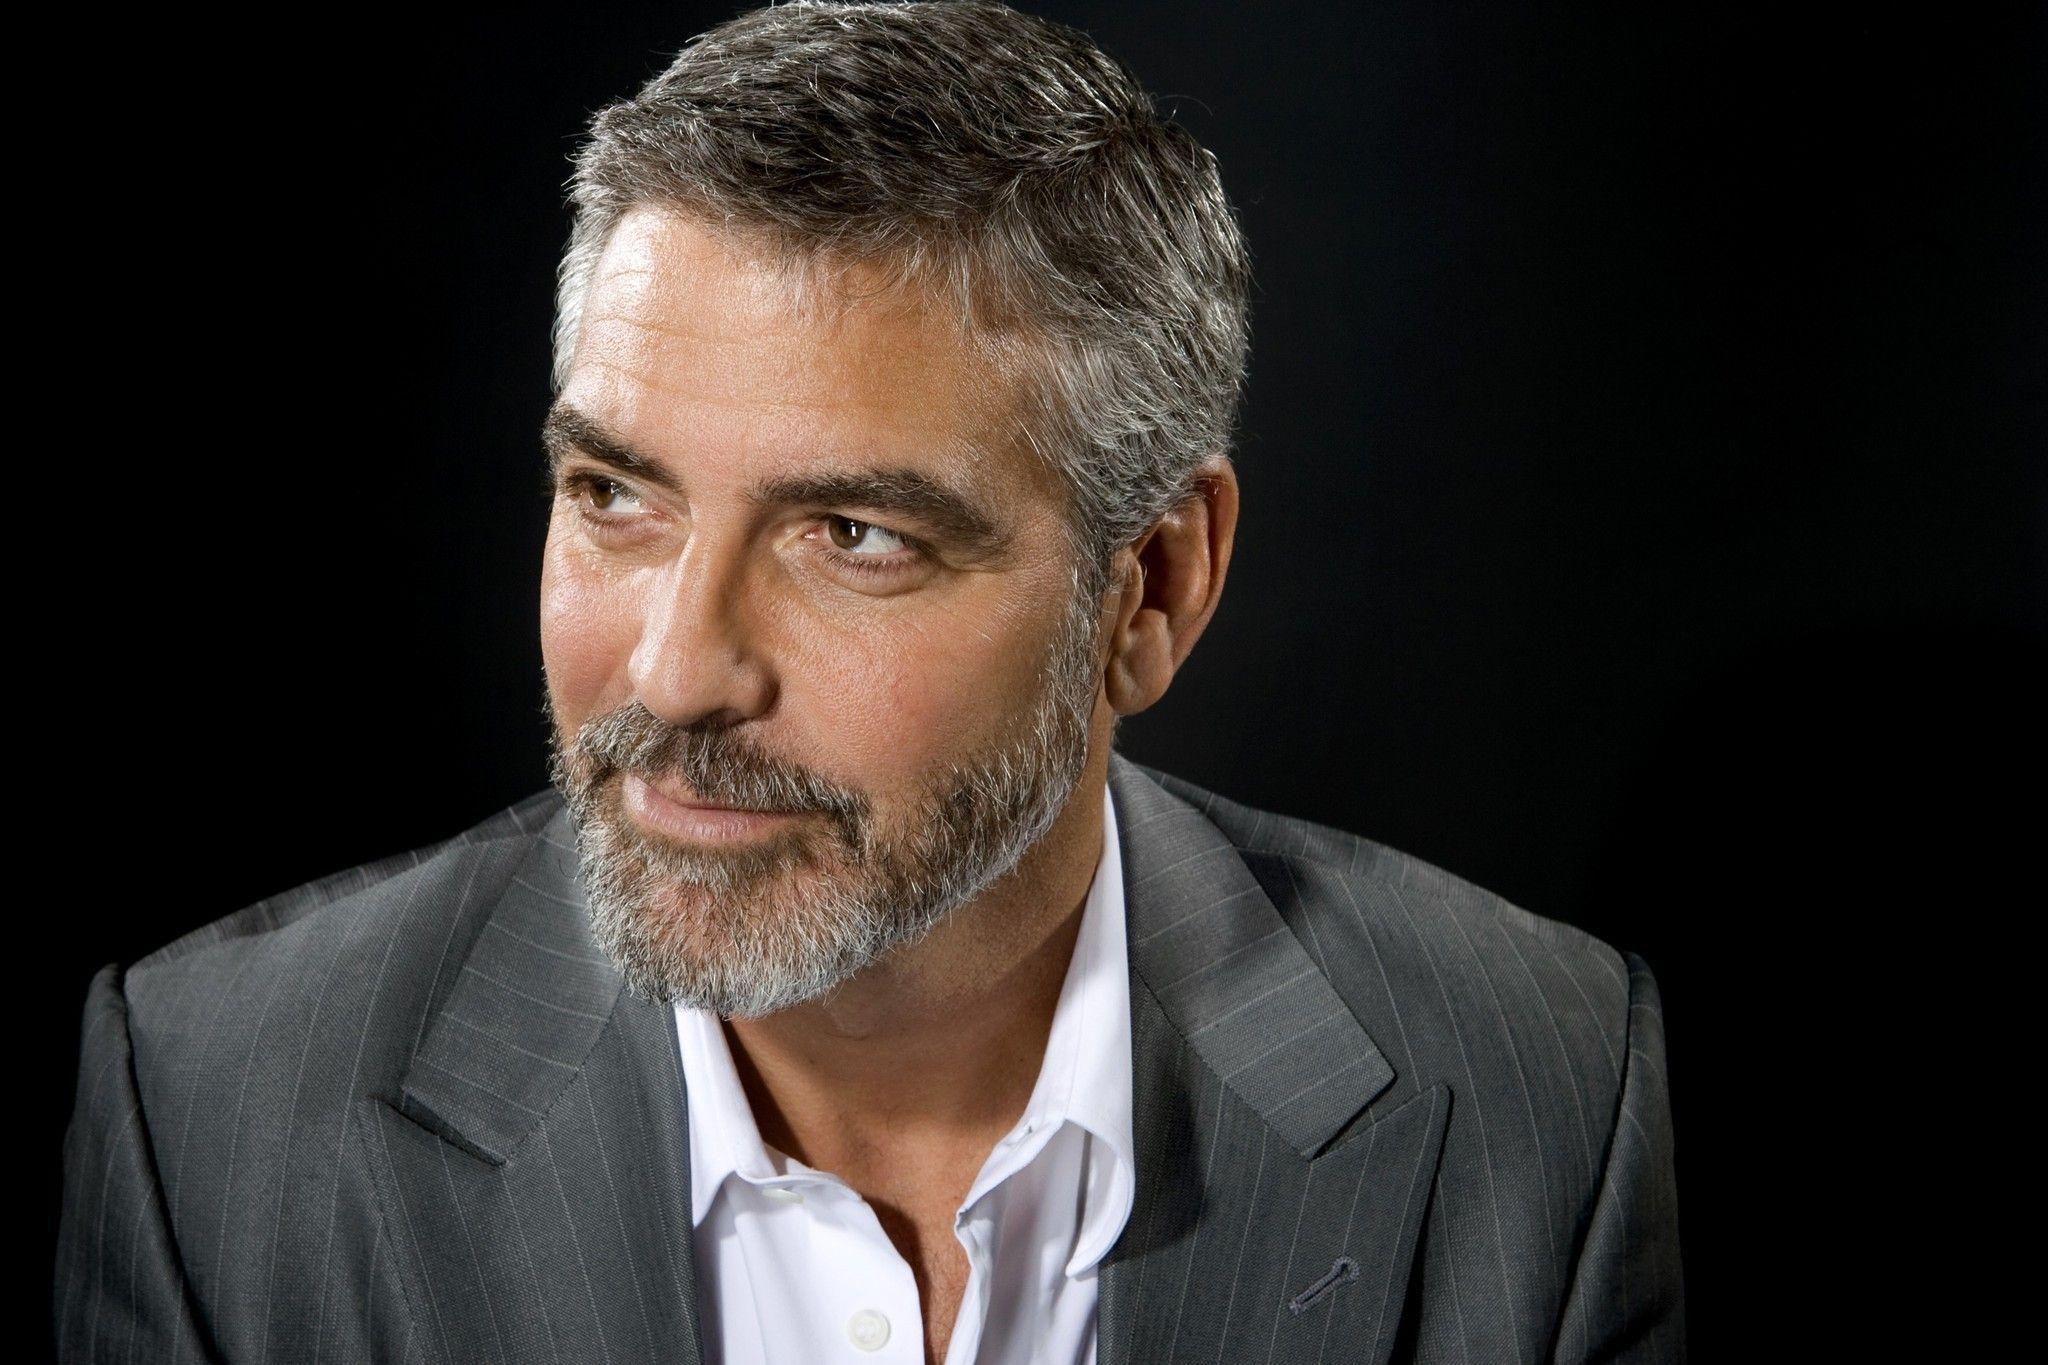 George Clooney Free Hd Wallpapers